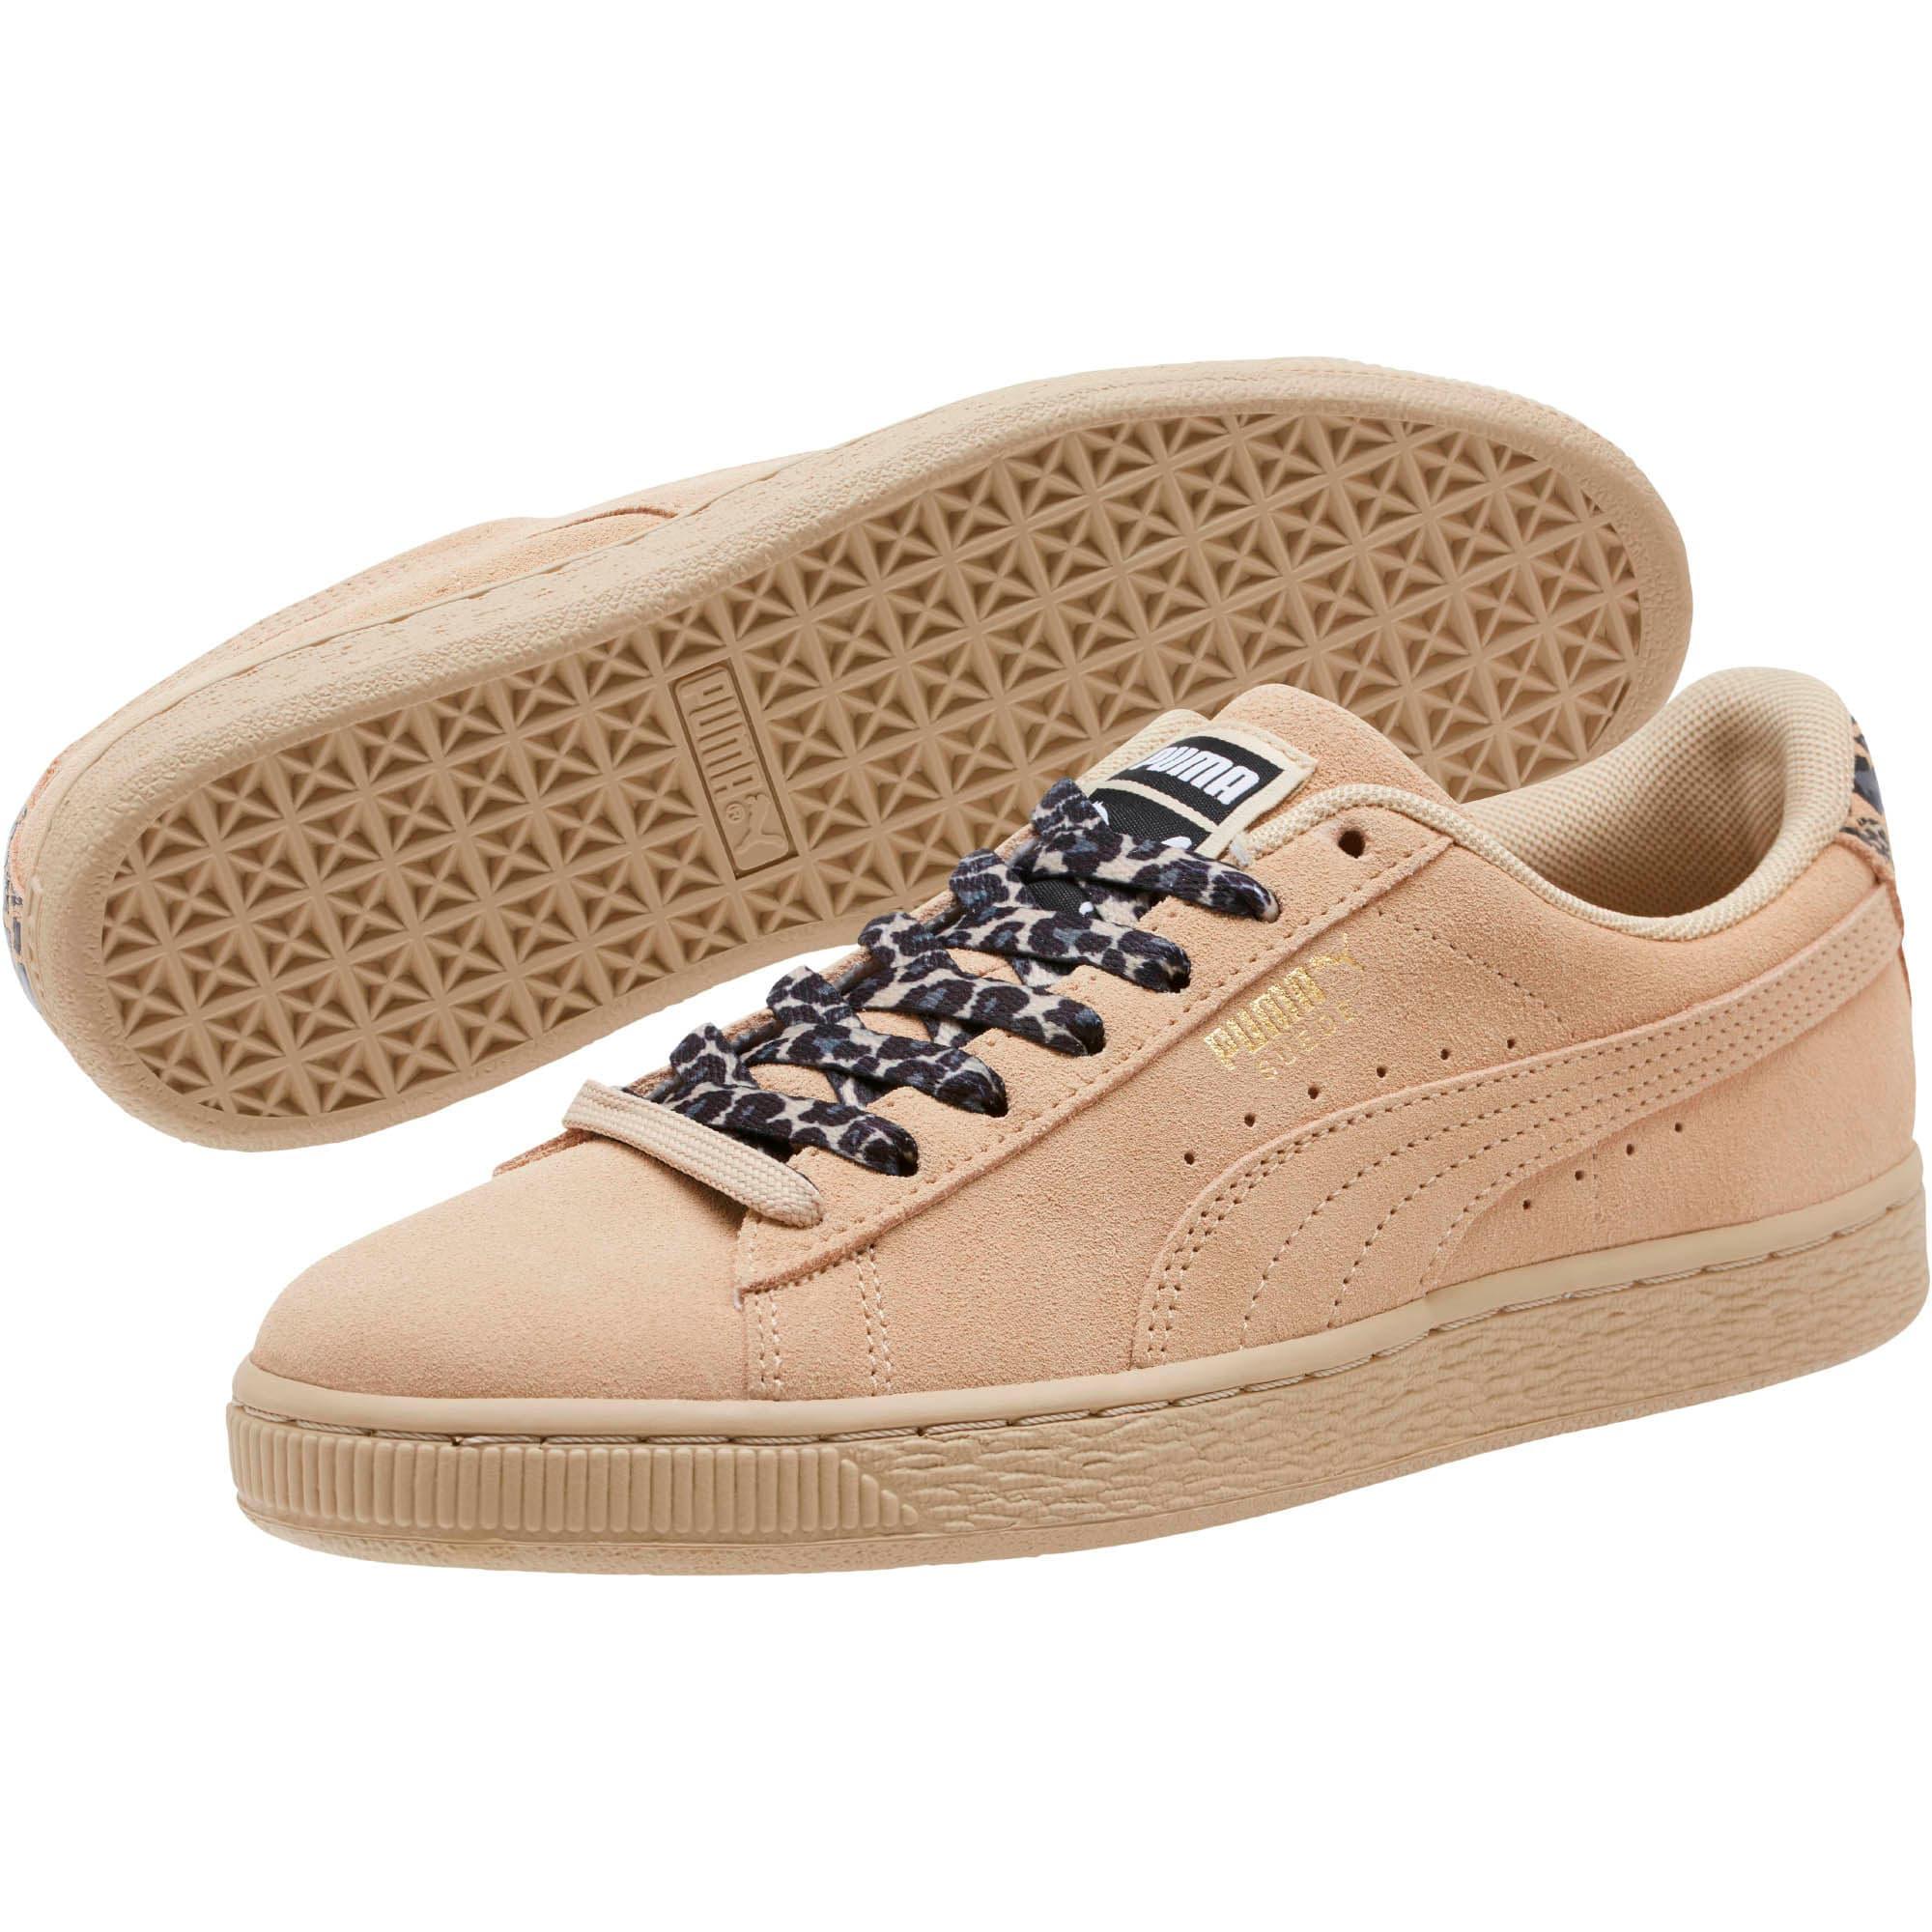 Thumbnail 2 of Suede Wild Women's Sneakers, Pebble- Gold-Puma Black, medium